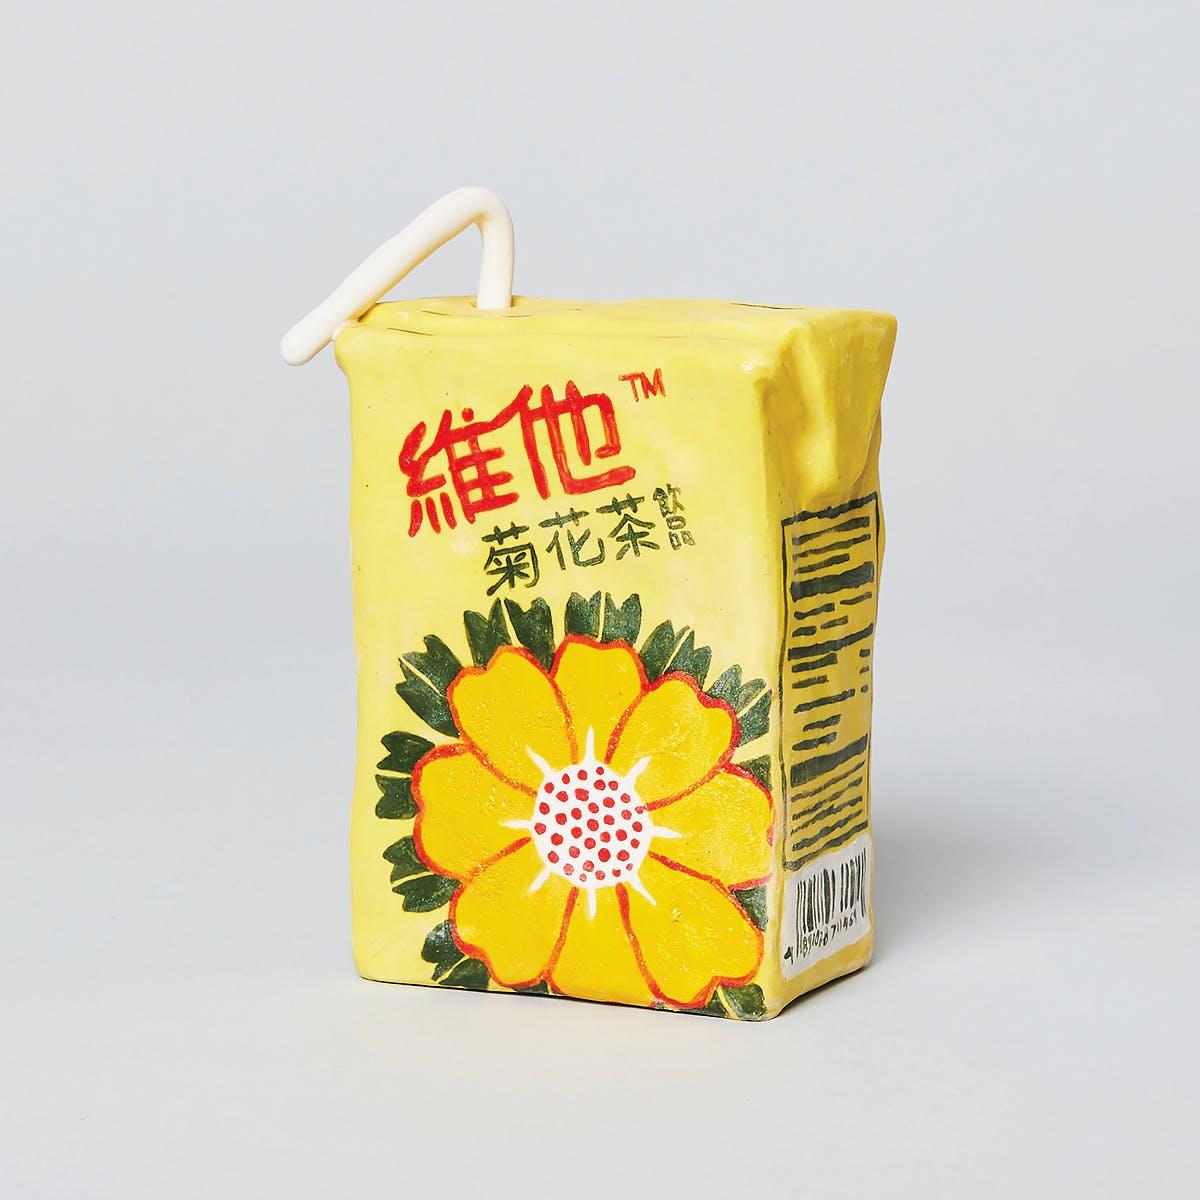 Ceramic replica of Vita Chrysanthemum Tea